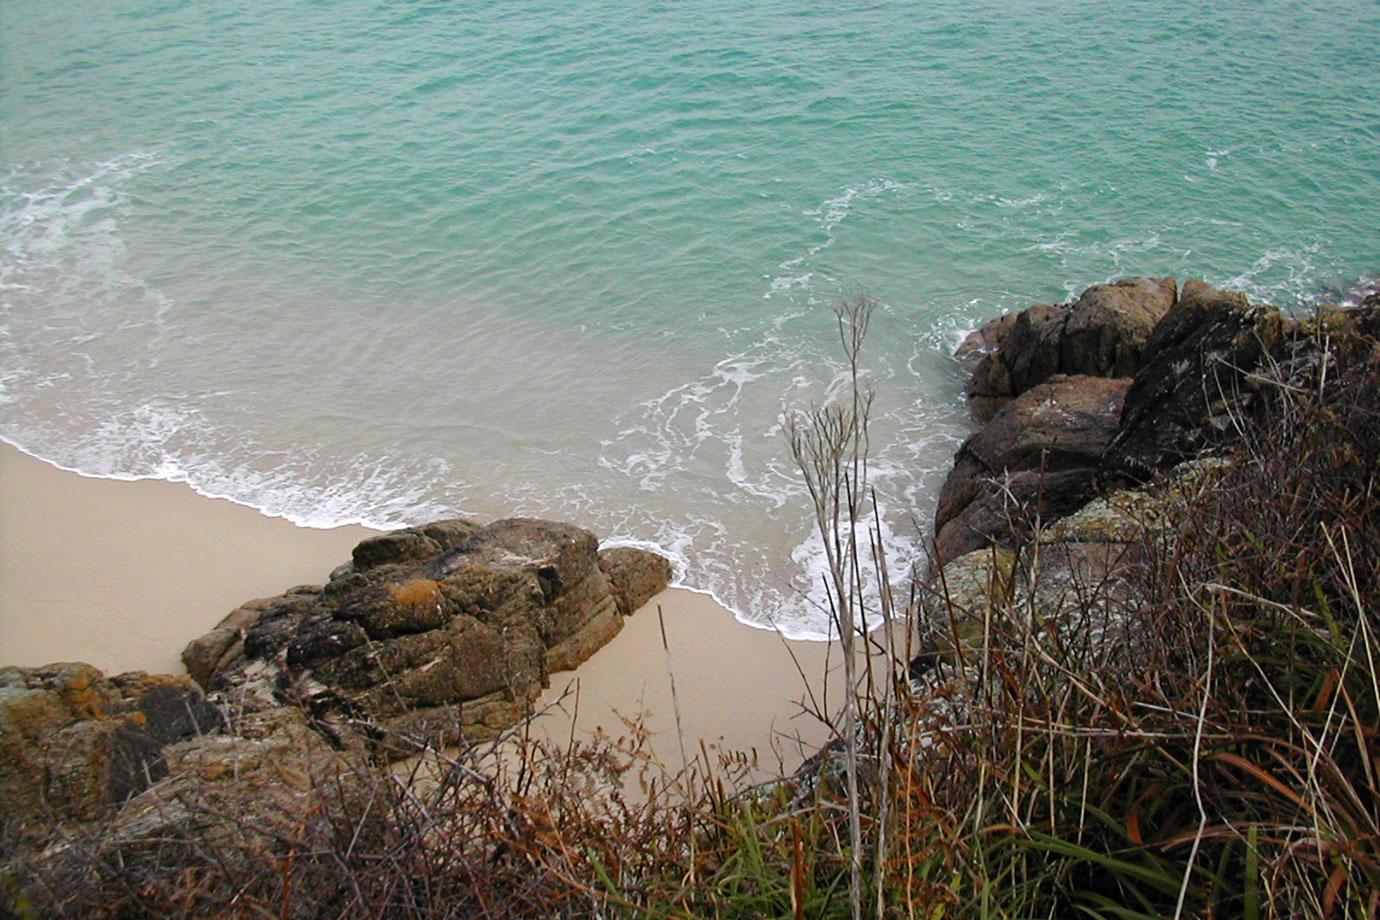 Porthcurno Bay